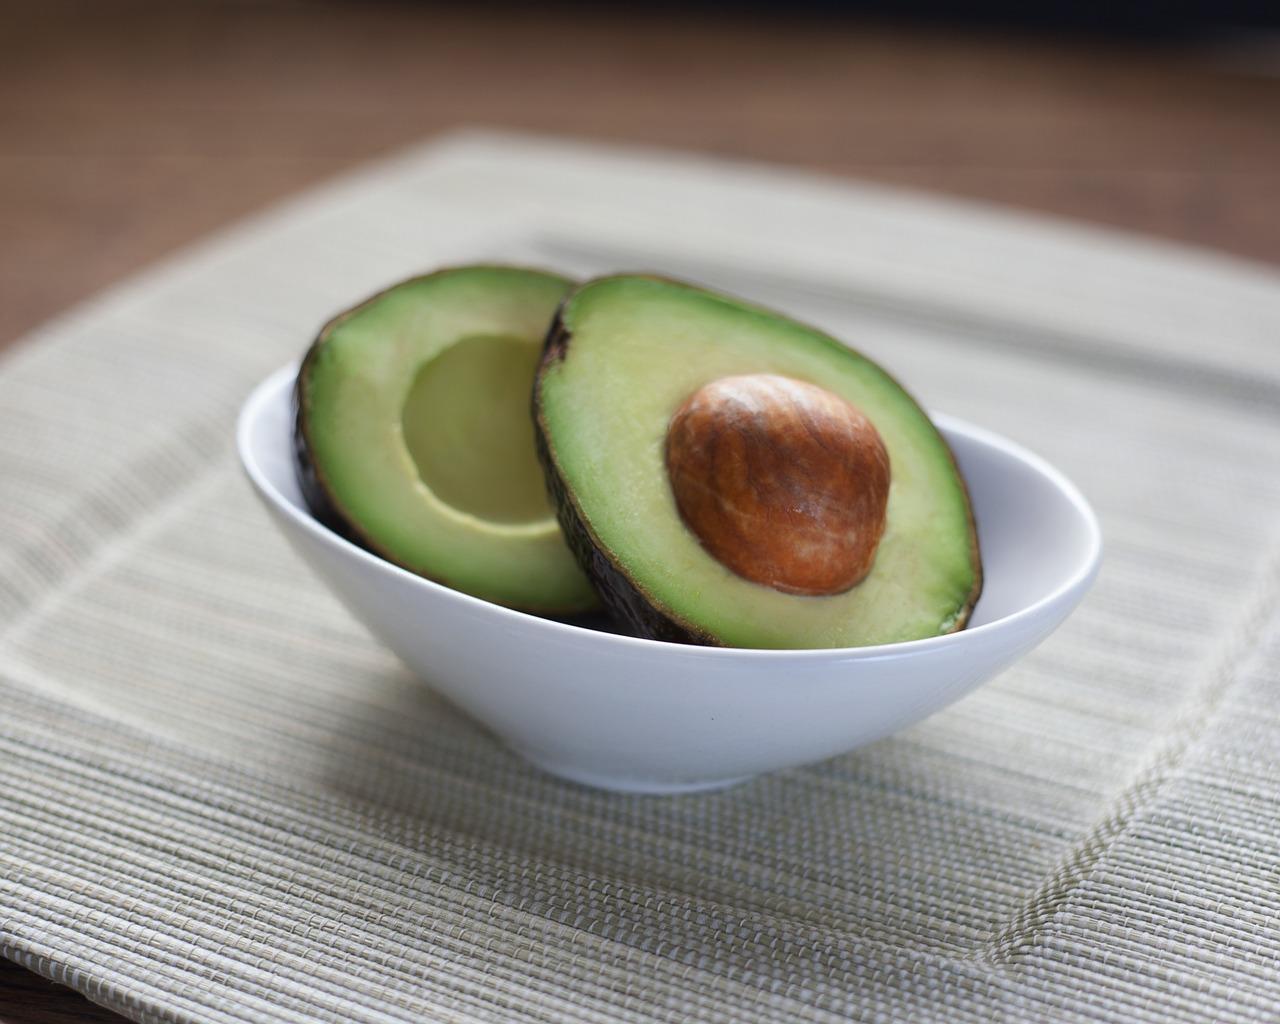 Avocado Deviled Eggs Recipe | Lean and Green Body Blog